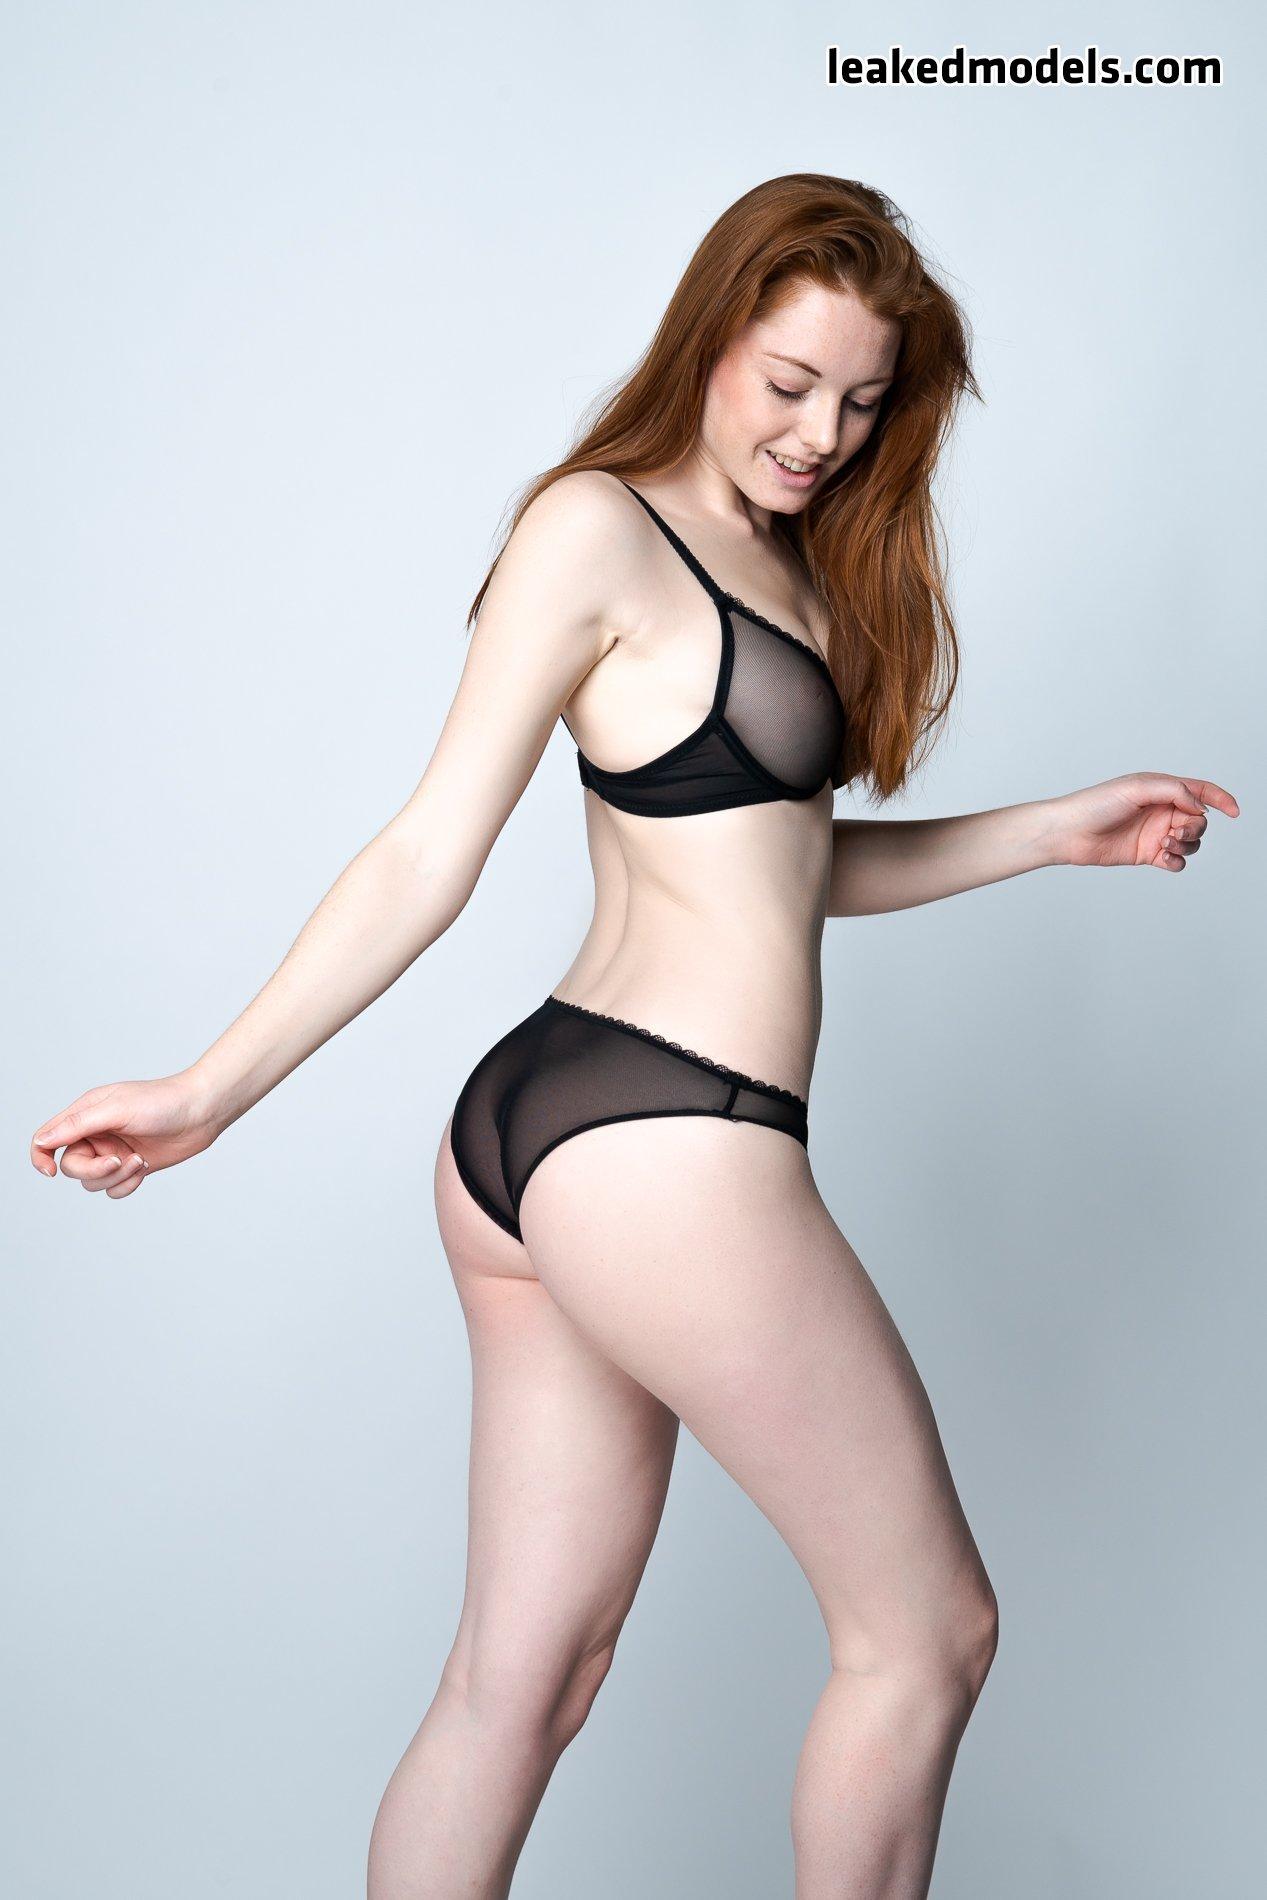 Willo Marchais Instagram Nude Leaks (25 Photos)